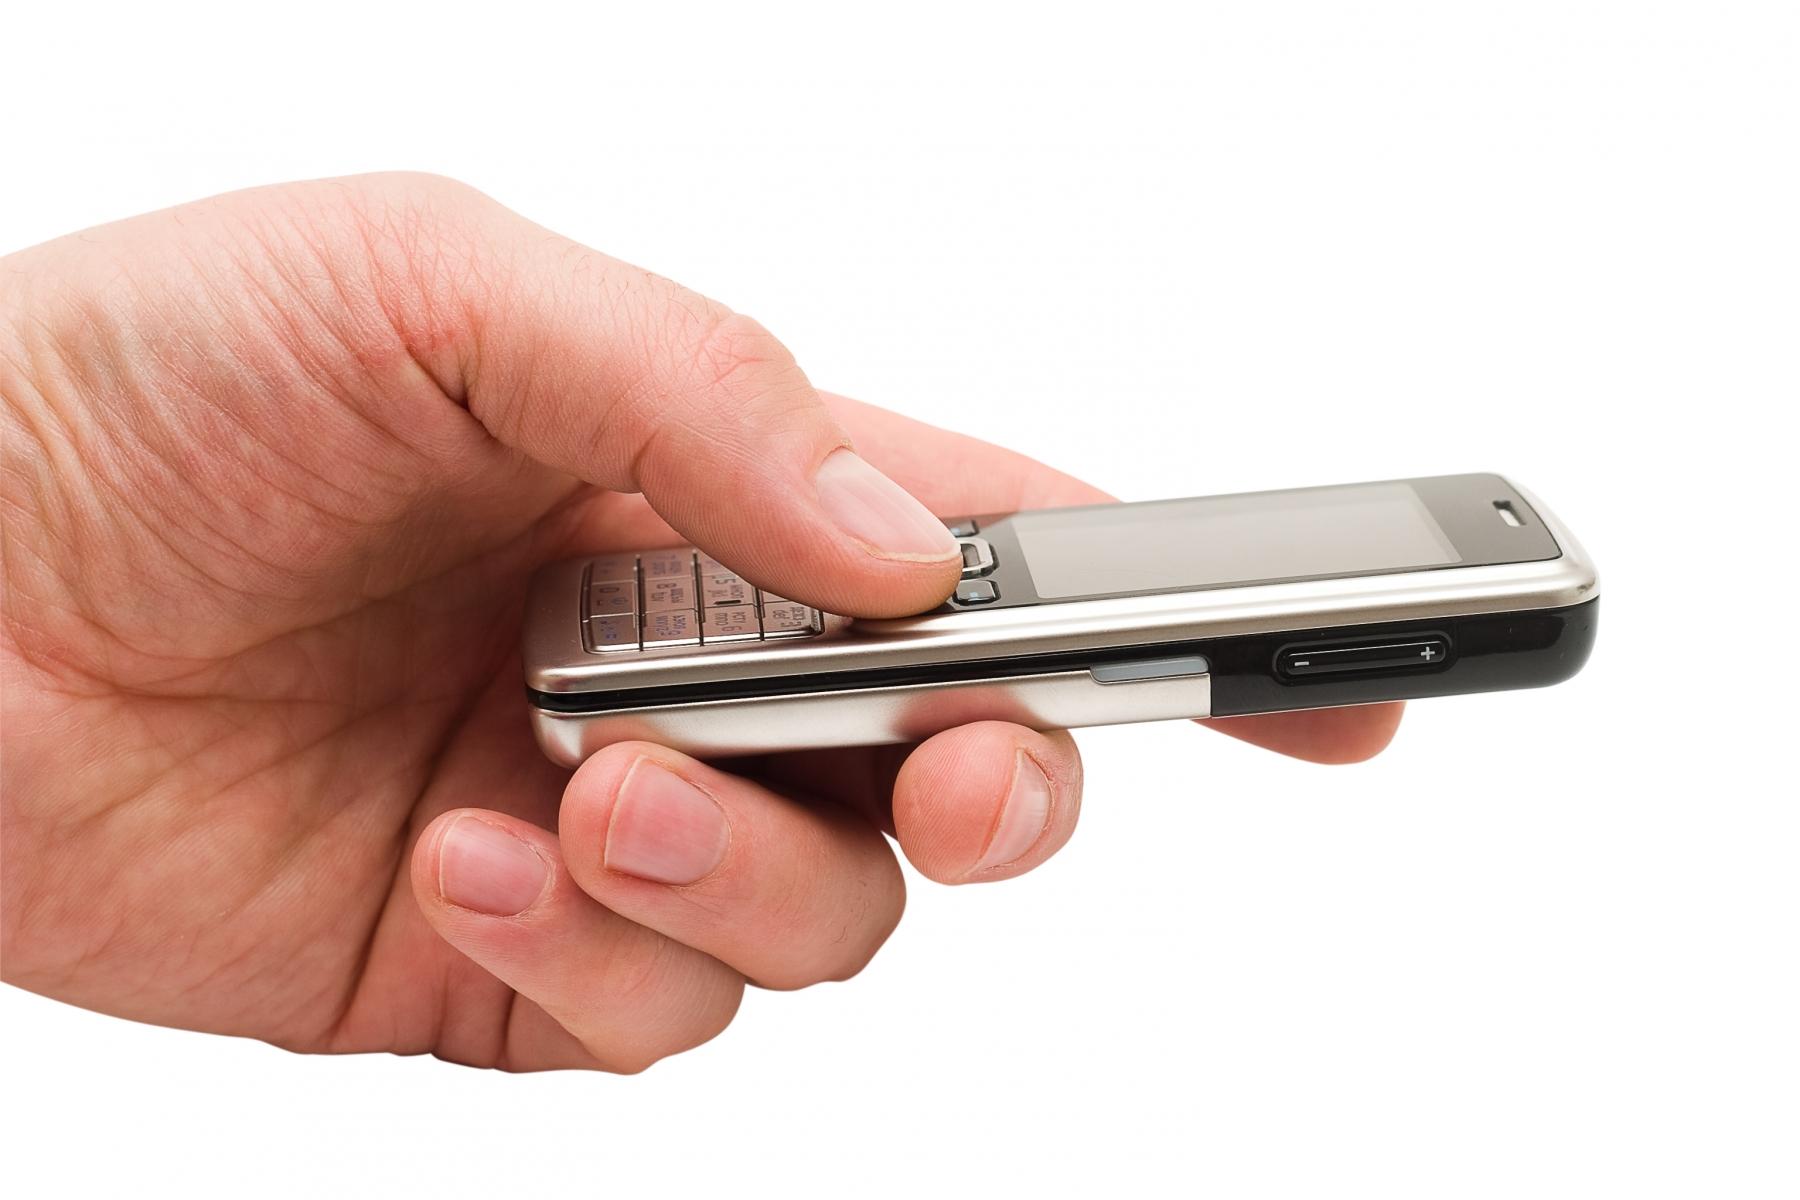 mobiltelefon hand